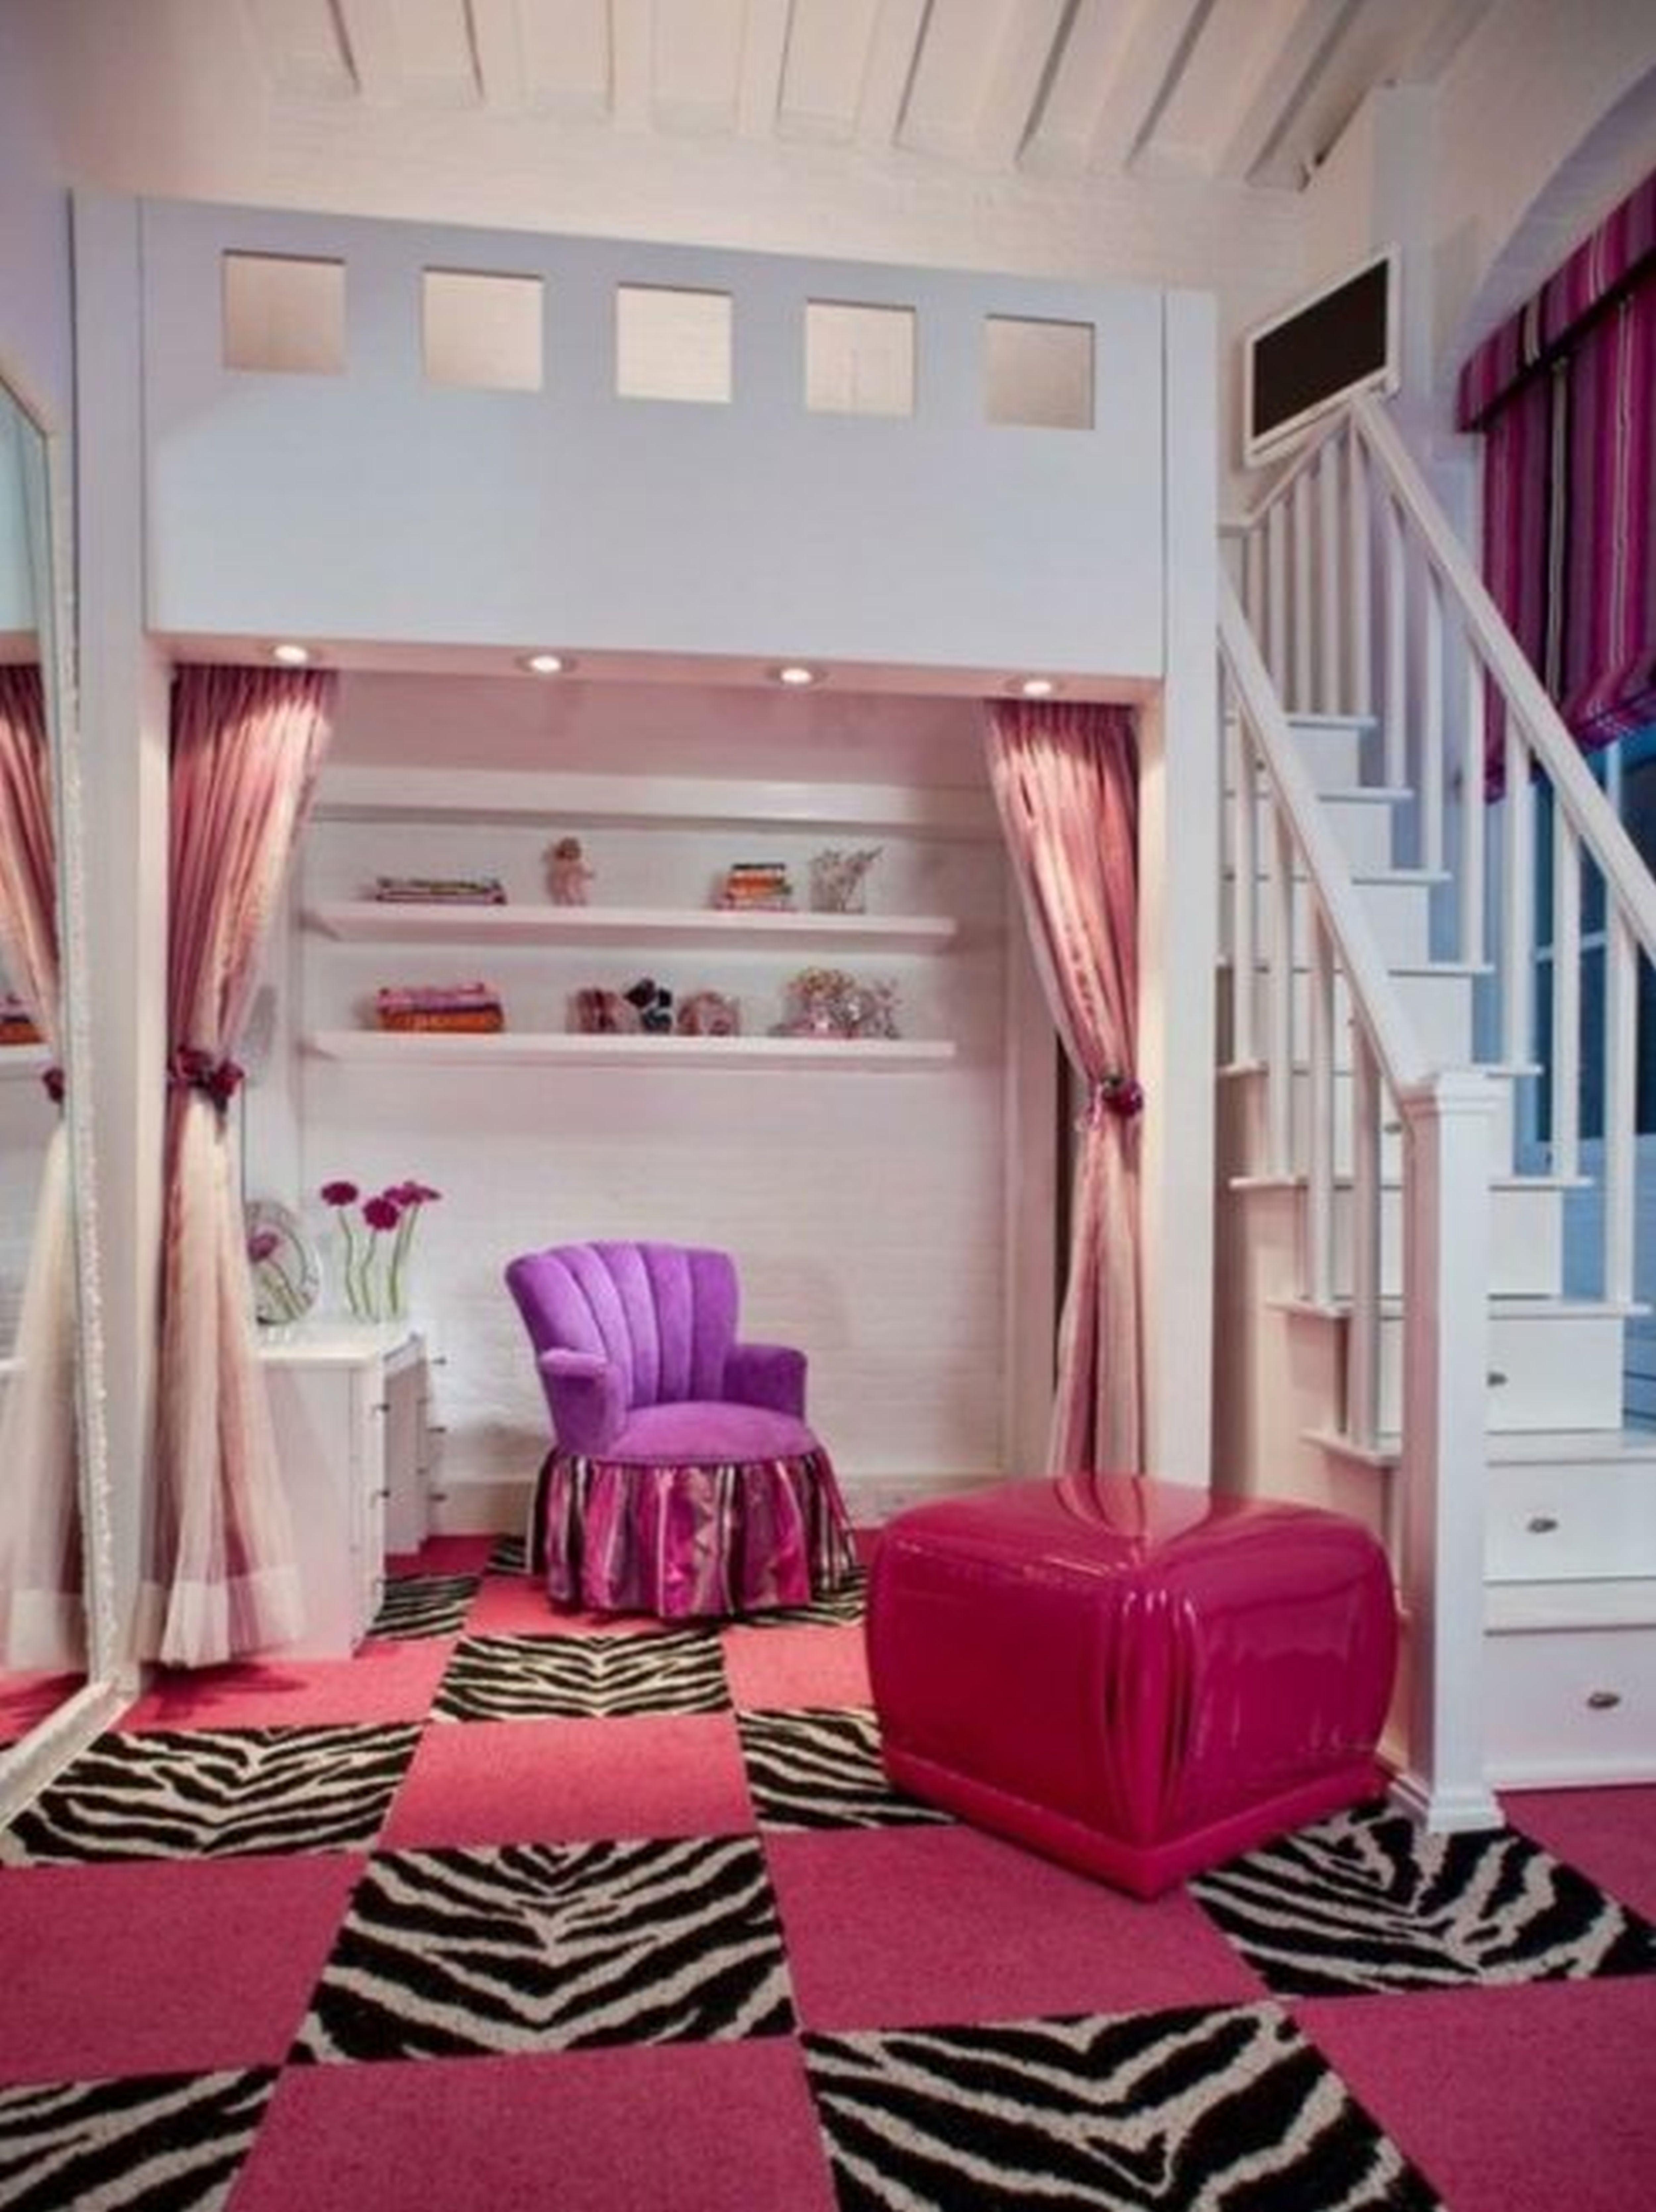 Medium Bedroom Ideas For Teenage Girls Tumblr Marble Throws Floor Lamps Nickel Aidan Gray Home Beach Style Polyester